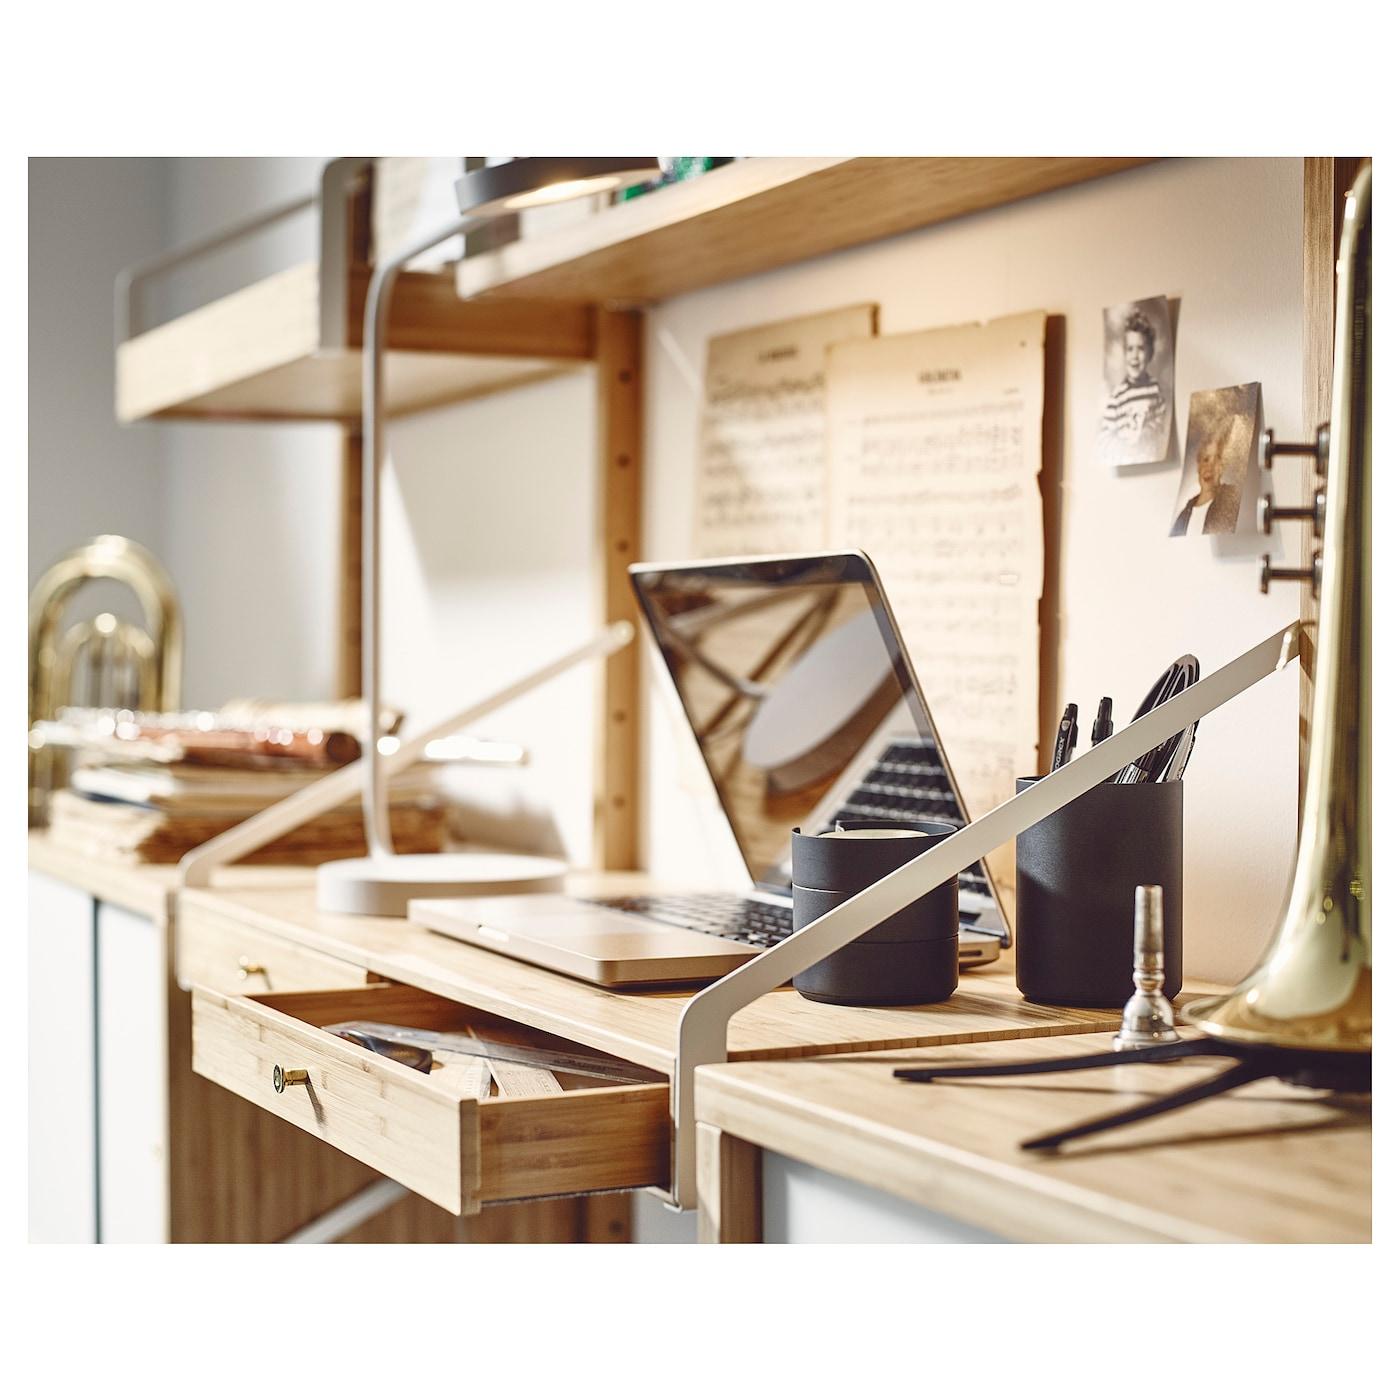 Svaln s bureau avec 2 tiroirs bambou 81x35 cm ikea for Bureau ikea avec tiroir classeur